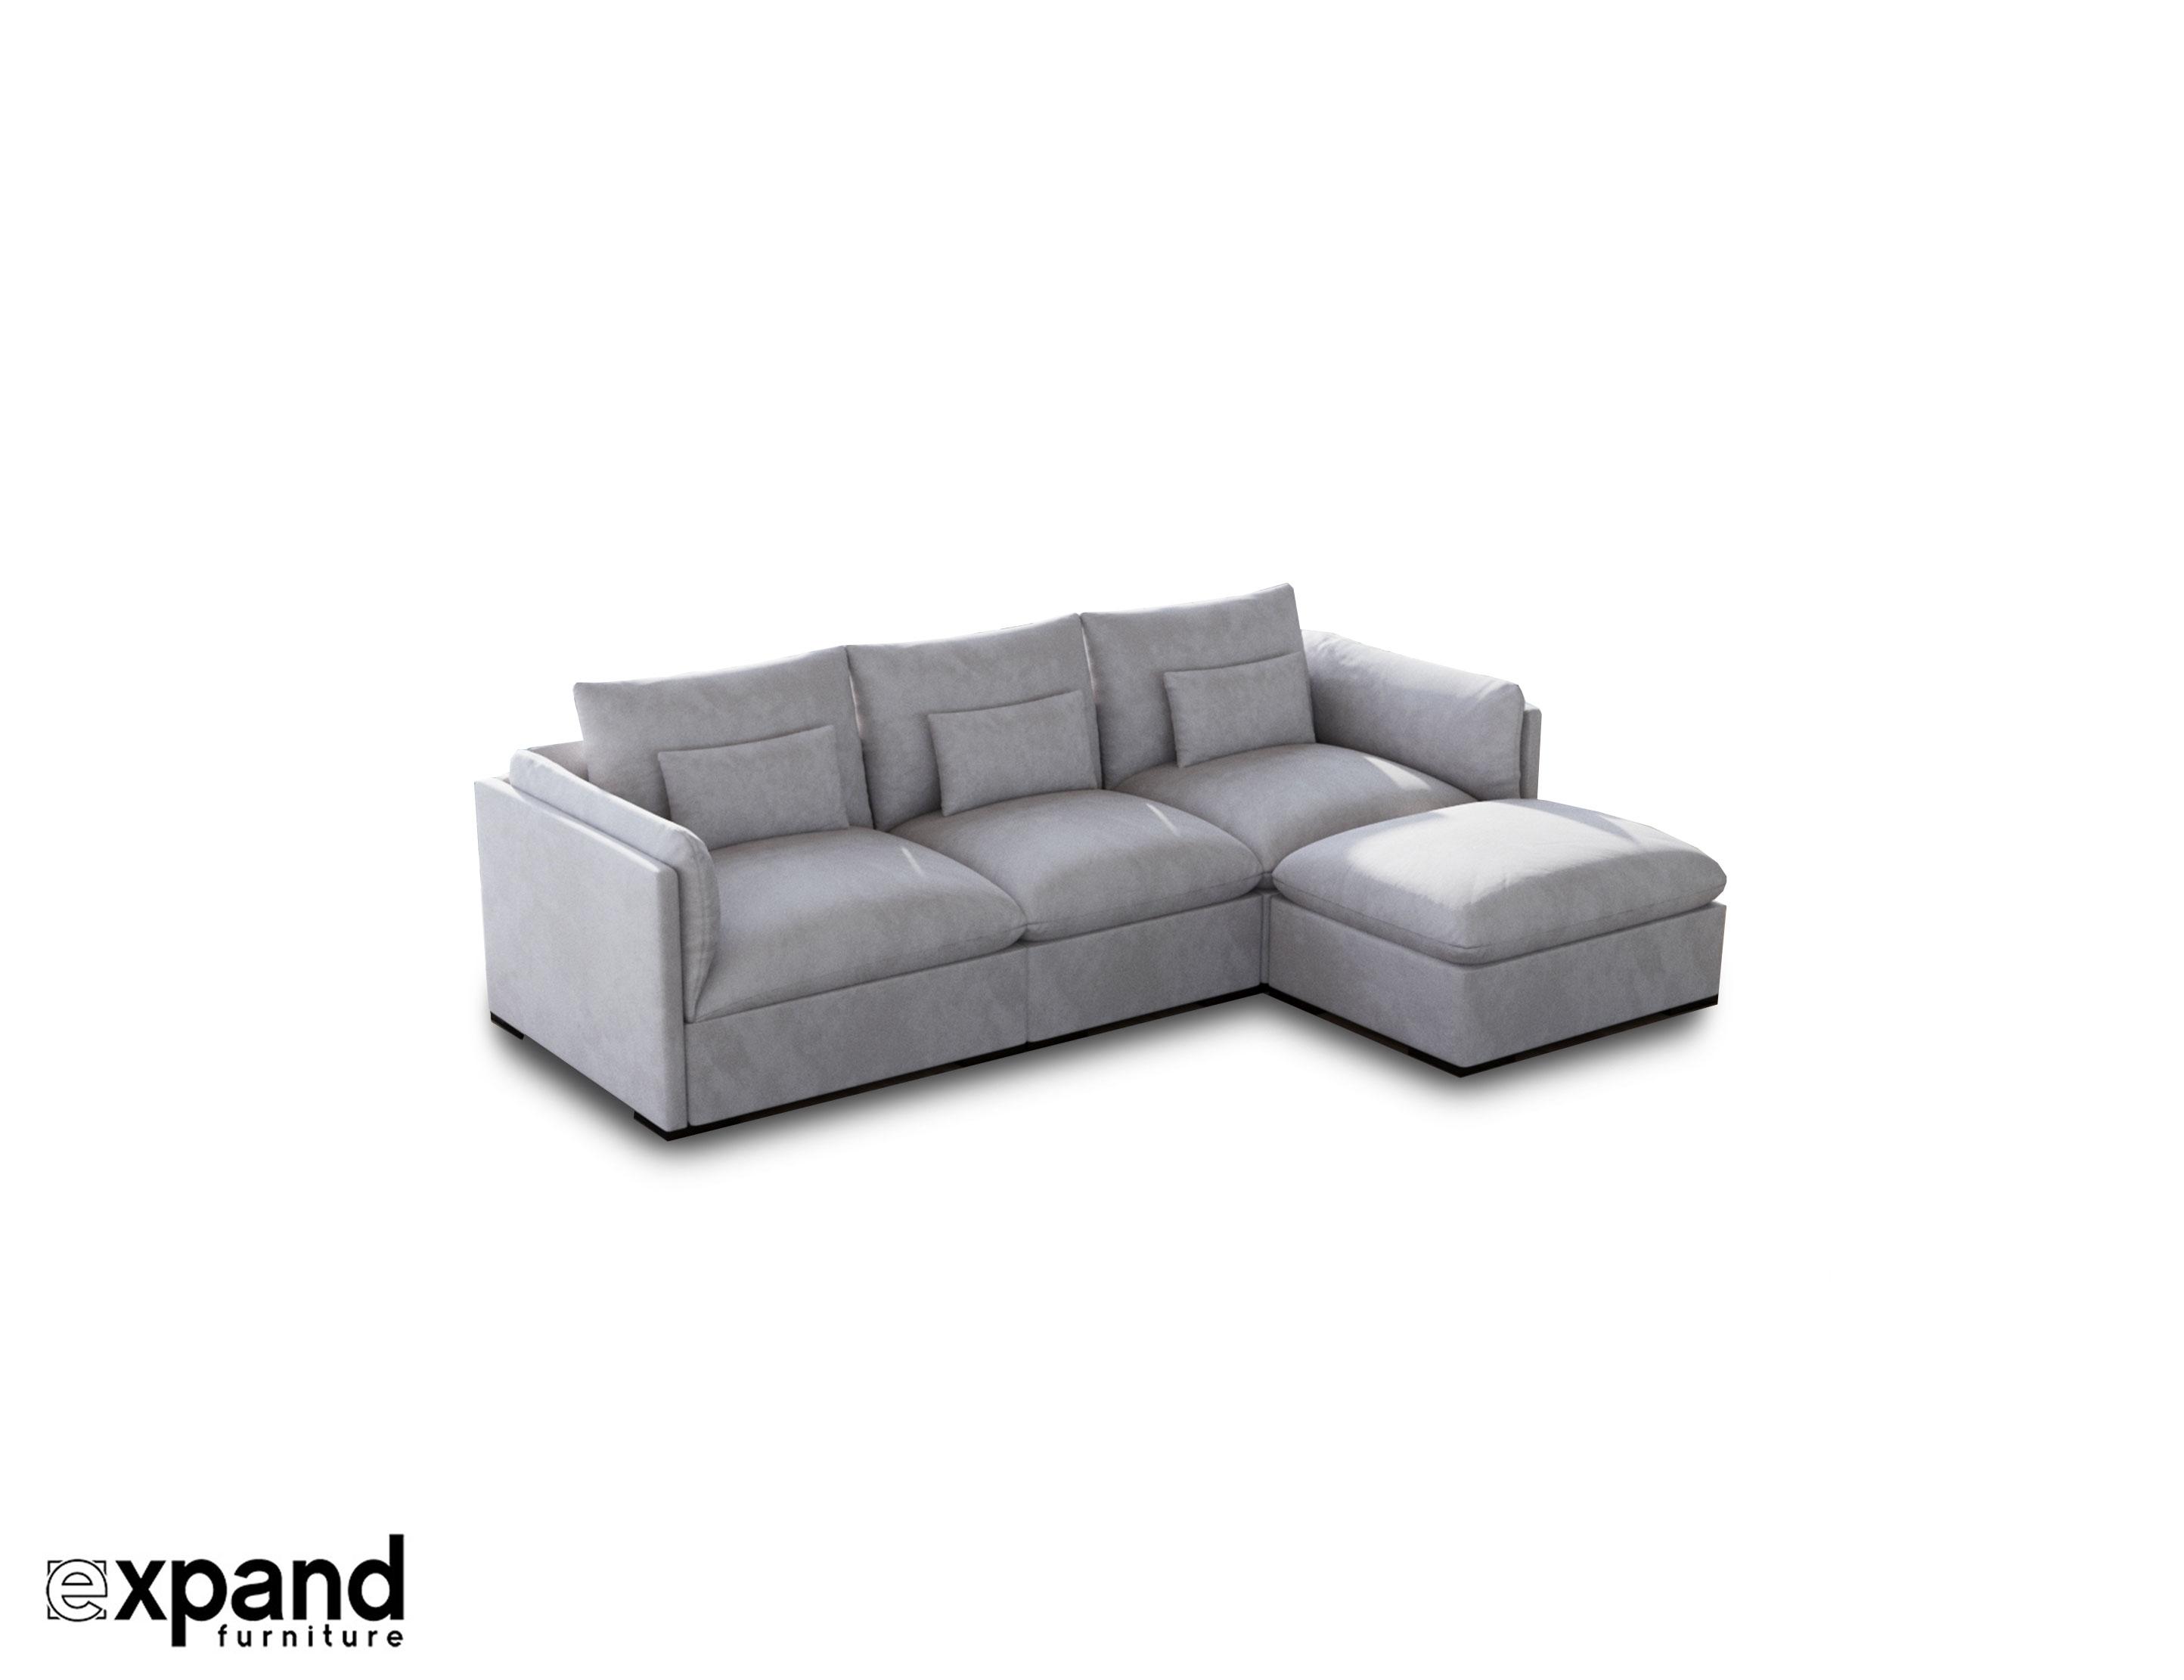 Sofa Modules Best 25 Modular Sofa Ideas On Pinterest Couch